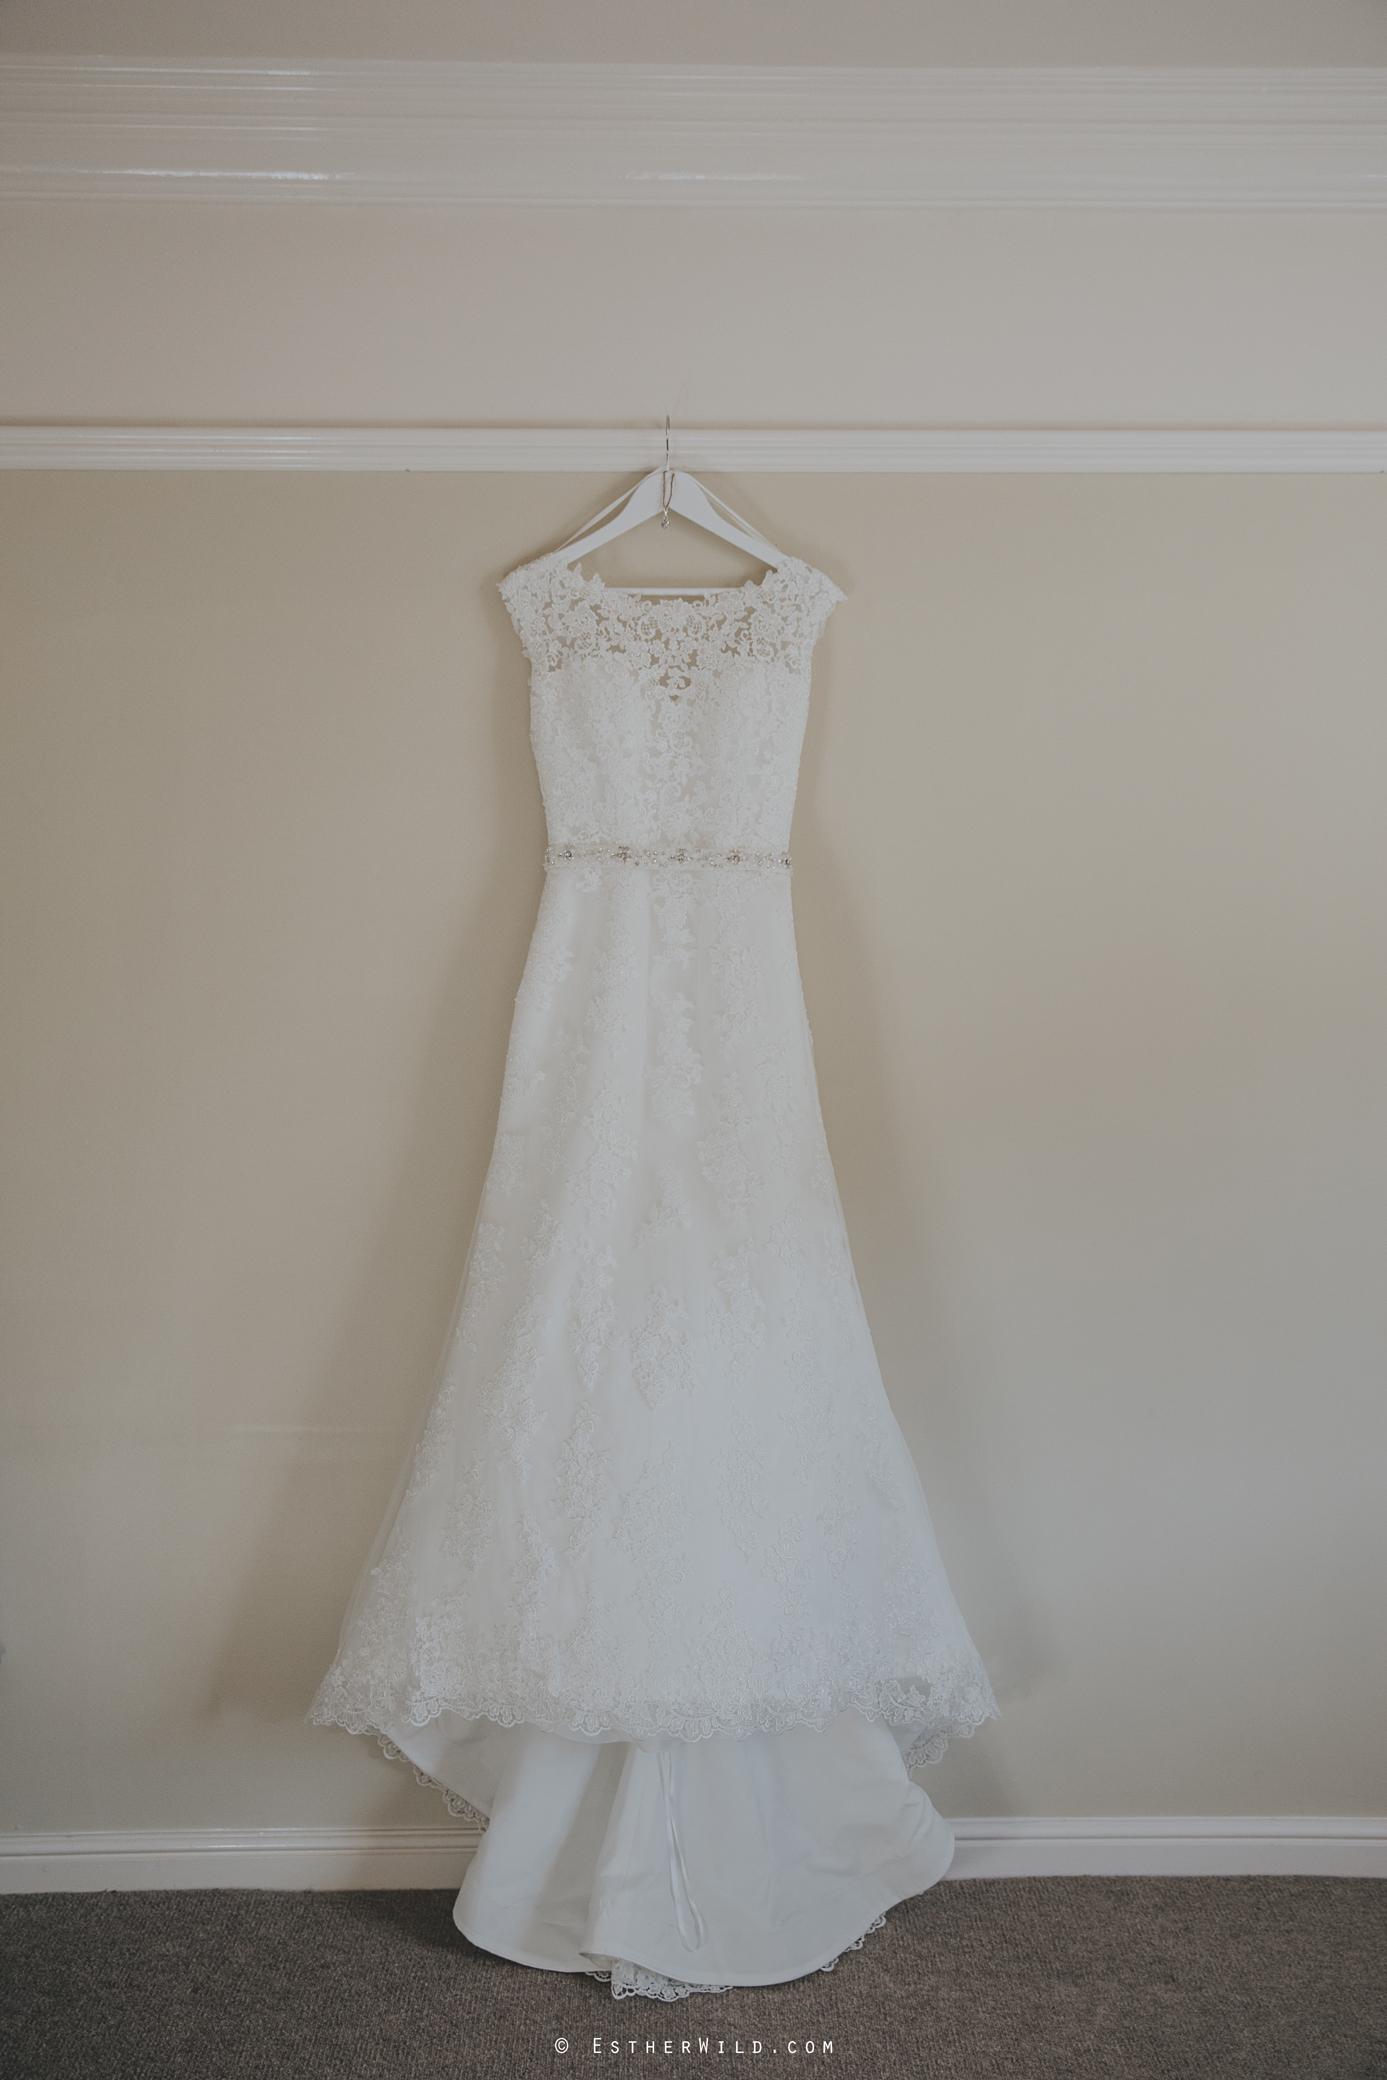 Wedding_Kings_Lynn_Town_Hall_Norfolk_Photographer_Esther_Wild_IMG_0090.jpg